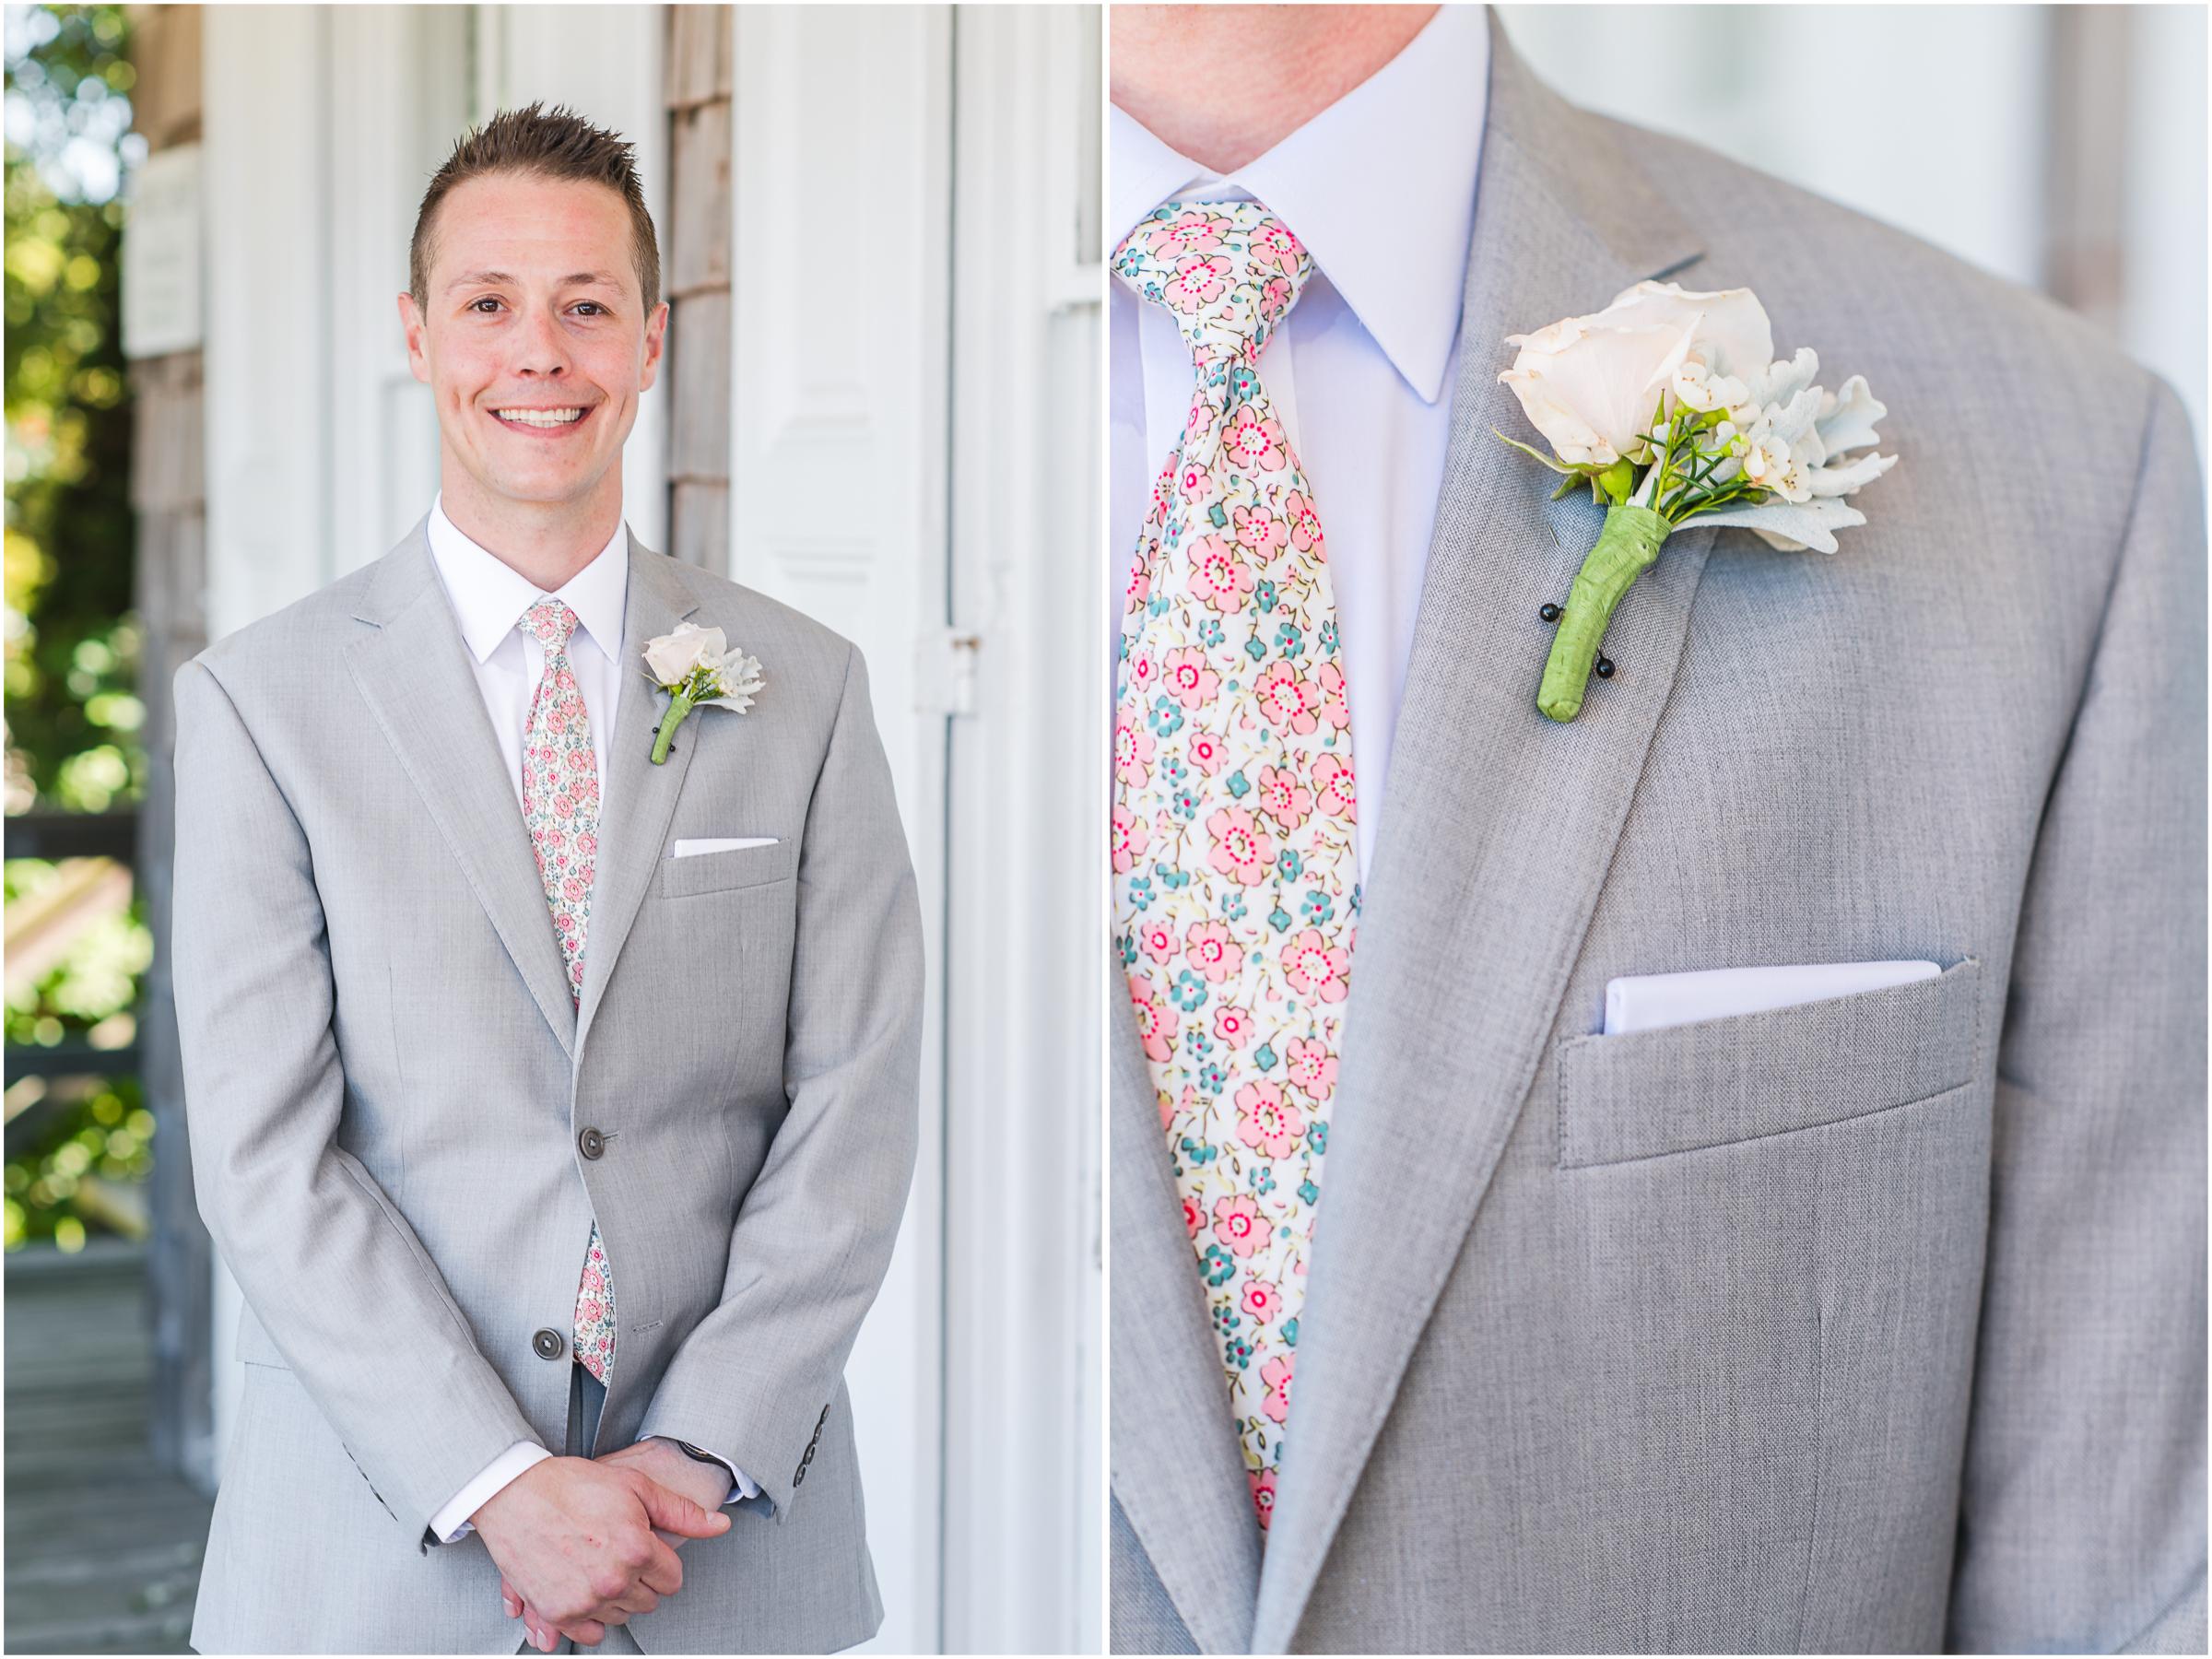 lbi-wedding-arts-foundation-lbi-wedding-photographer-19.jpg